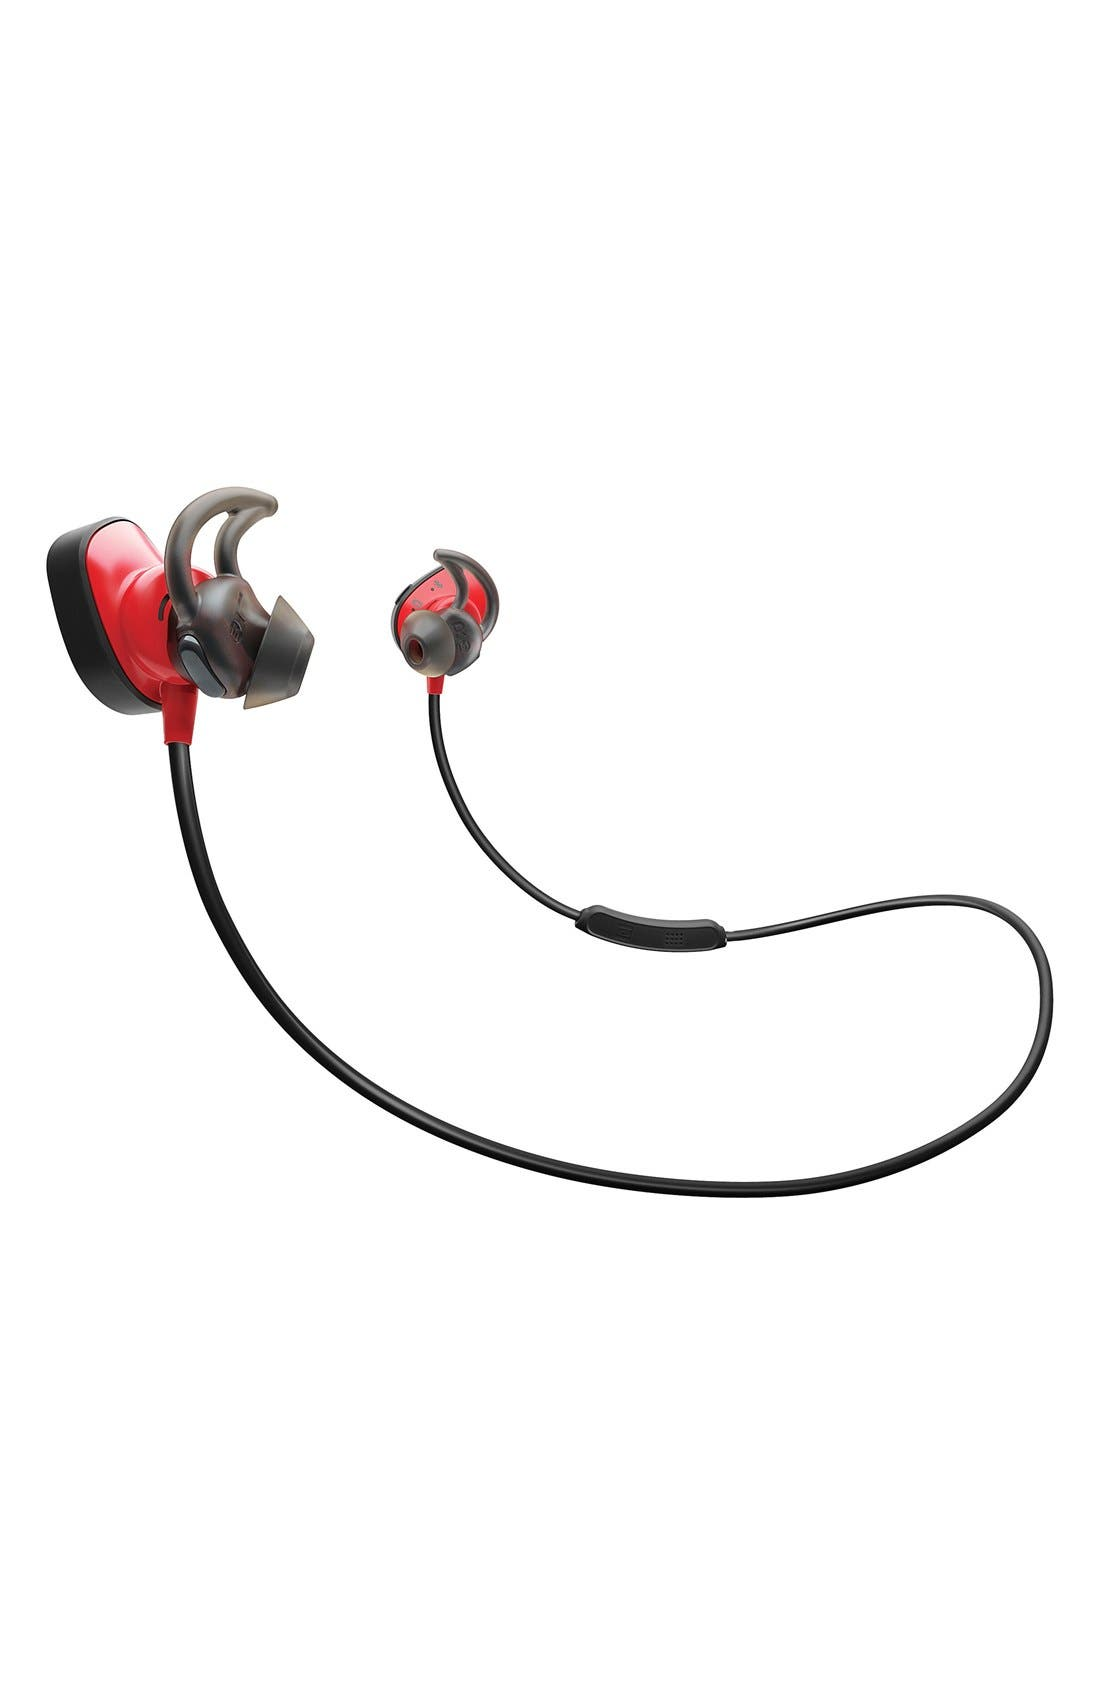 Main Image - Bose® SoundSport® Pulse Wireless Headphones